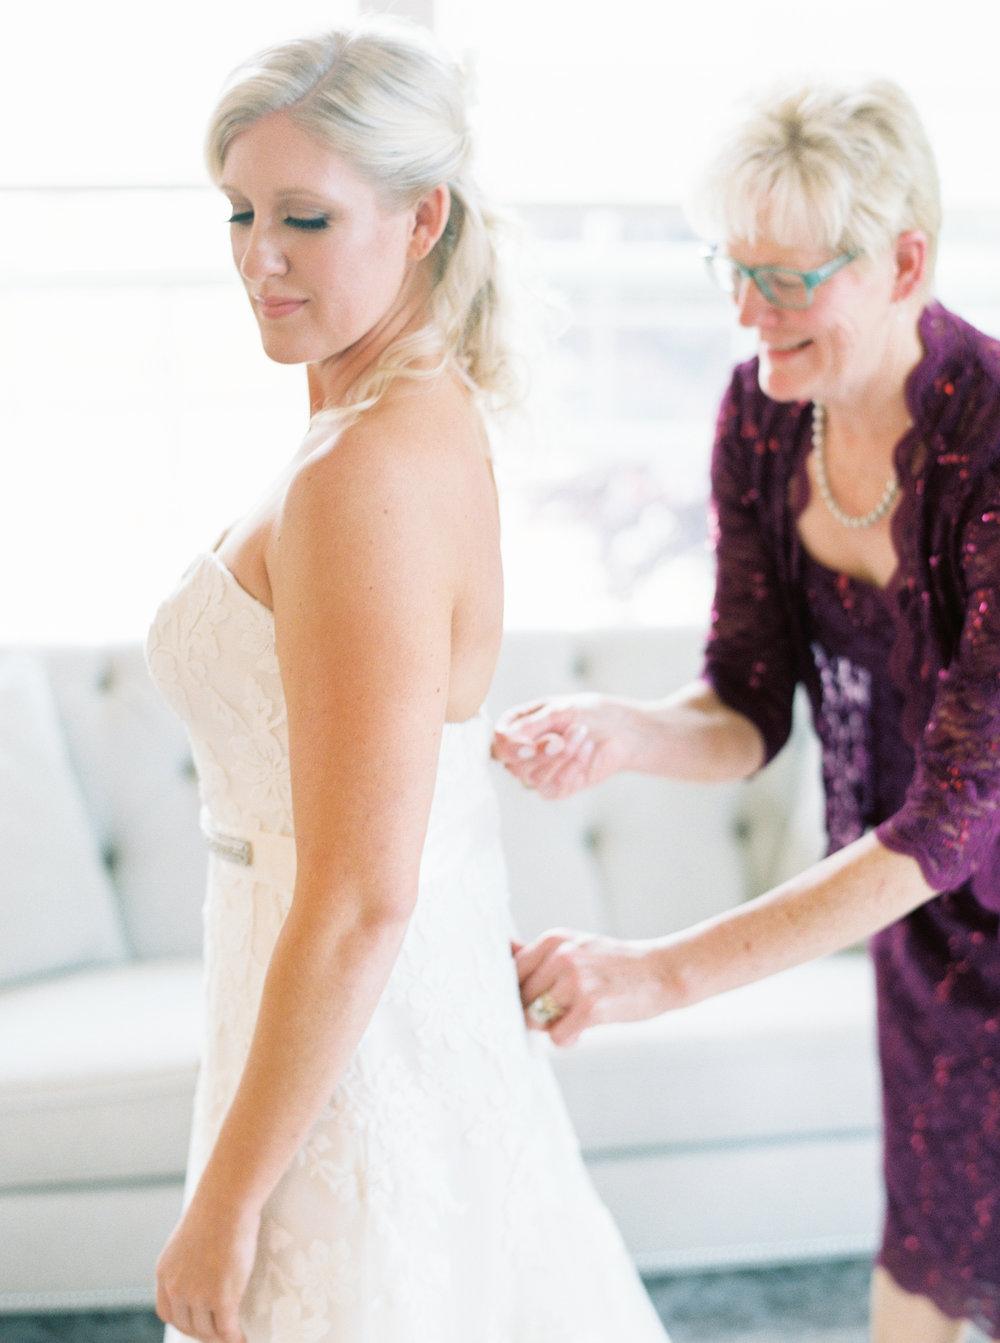 wolfe-heights-event-center-wedding-sacramento-california-wedding-84.jpg